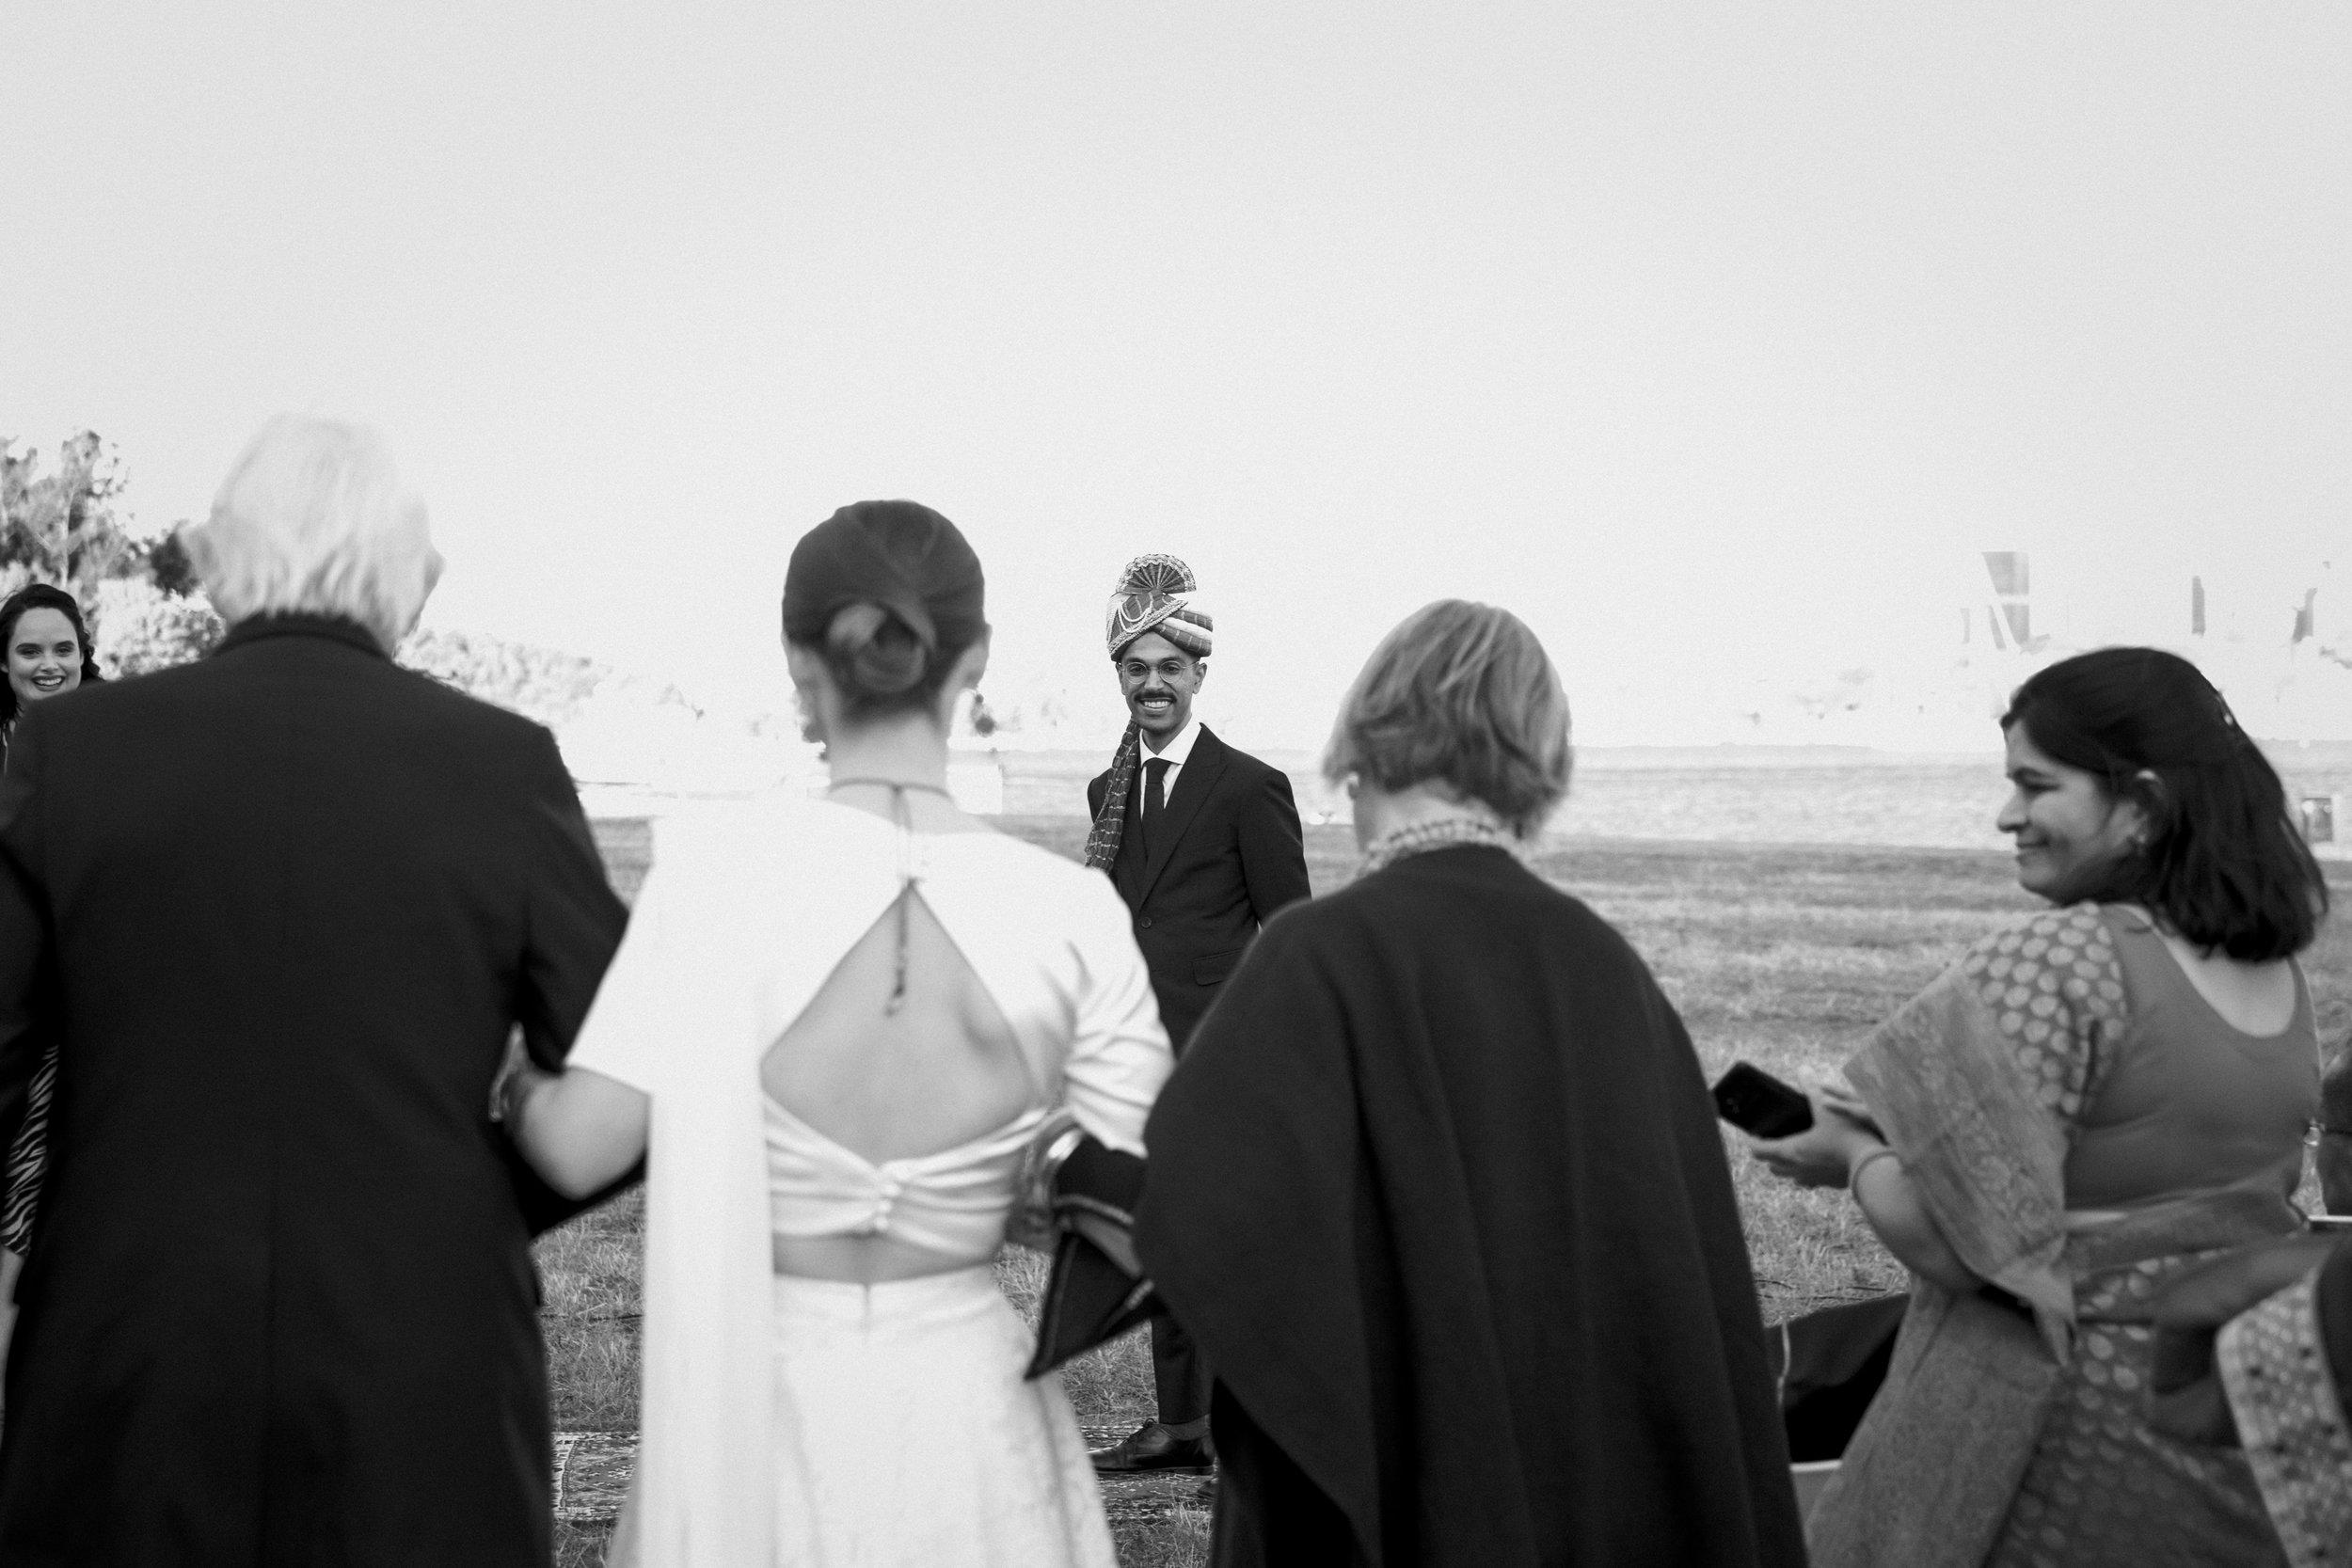 Amelia+Ani_Wedding_May2019_credit_OneDaySomewherePhotography-47.jpg